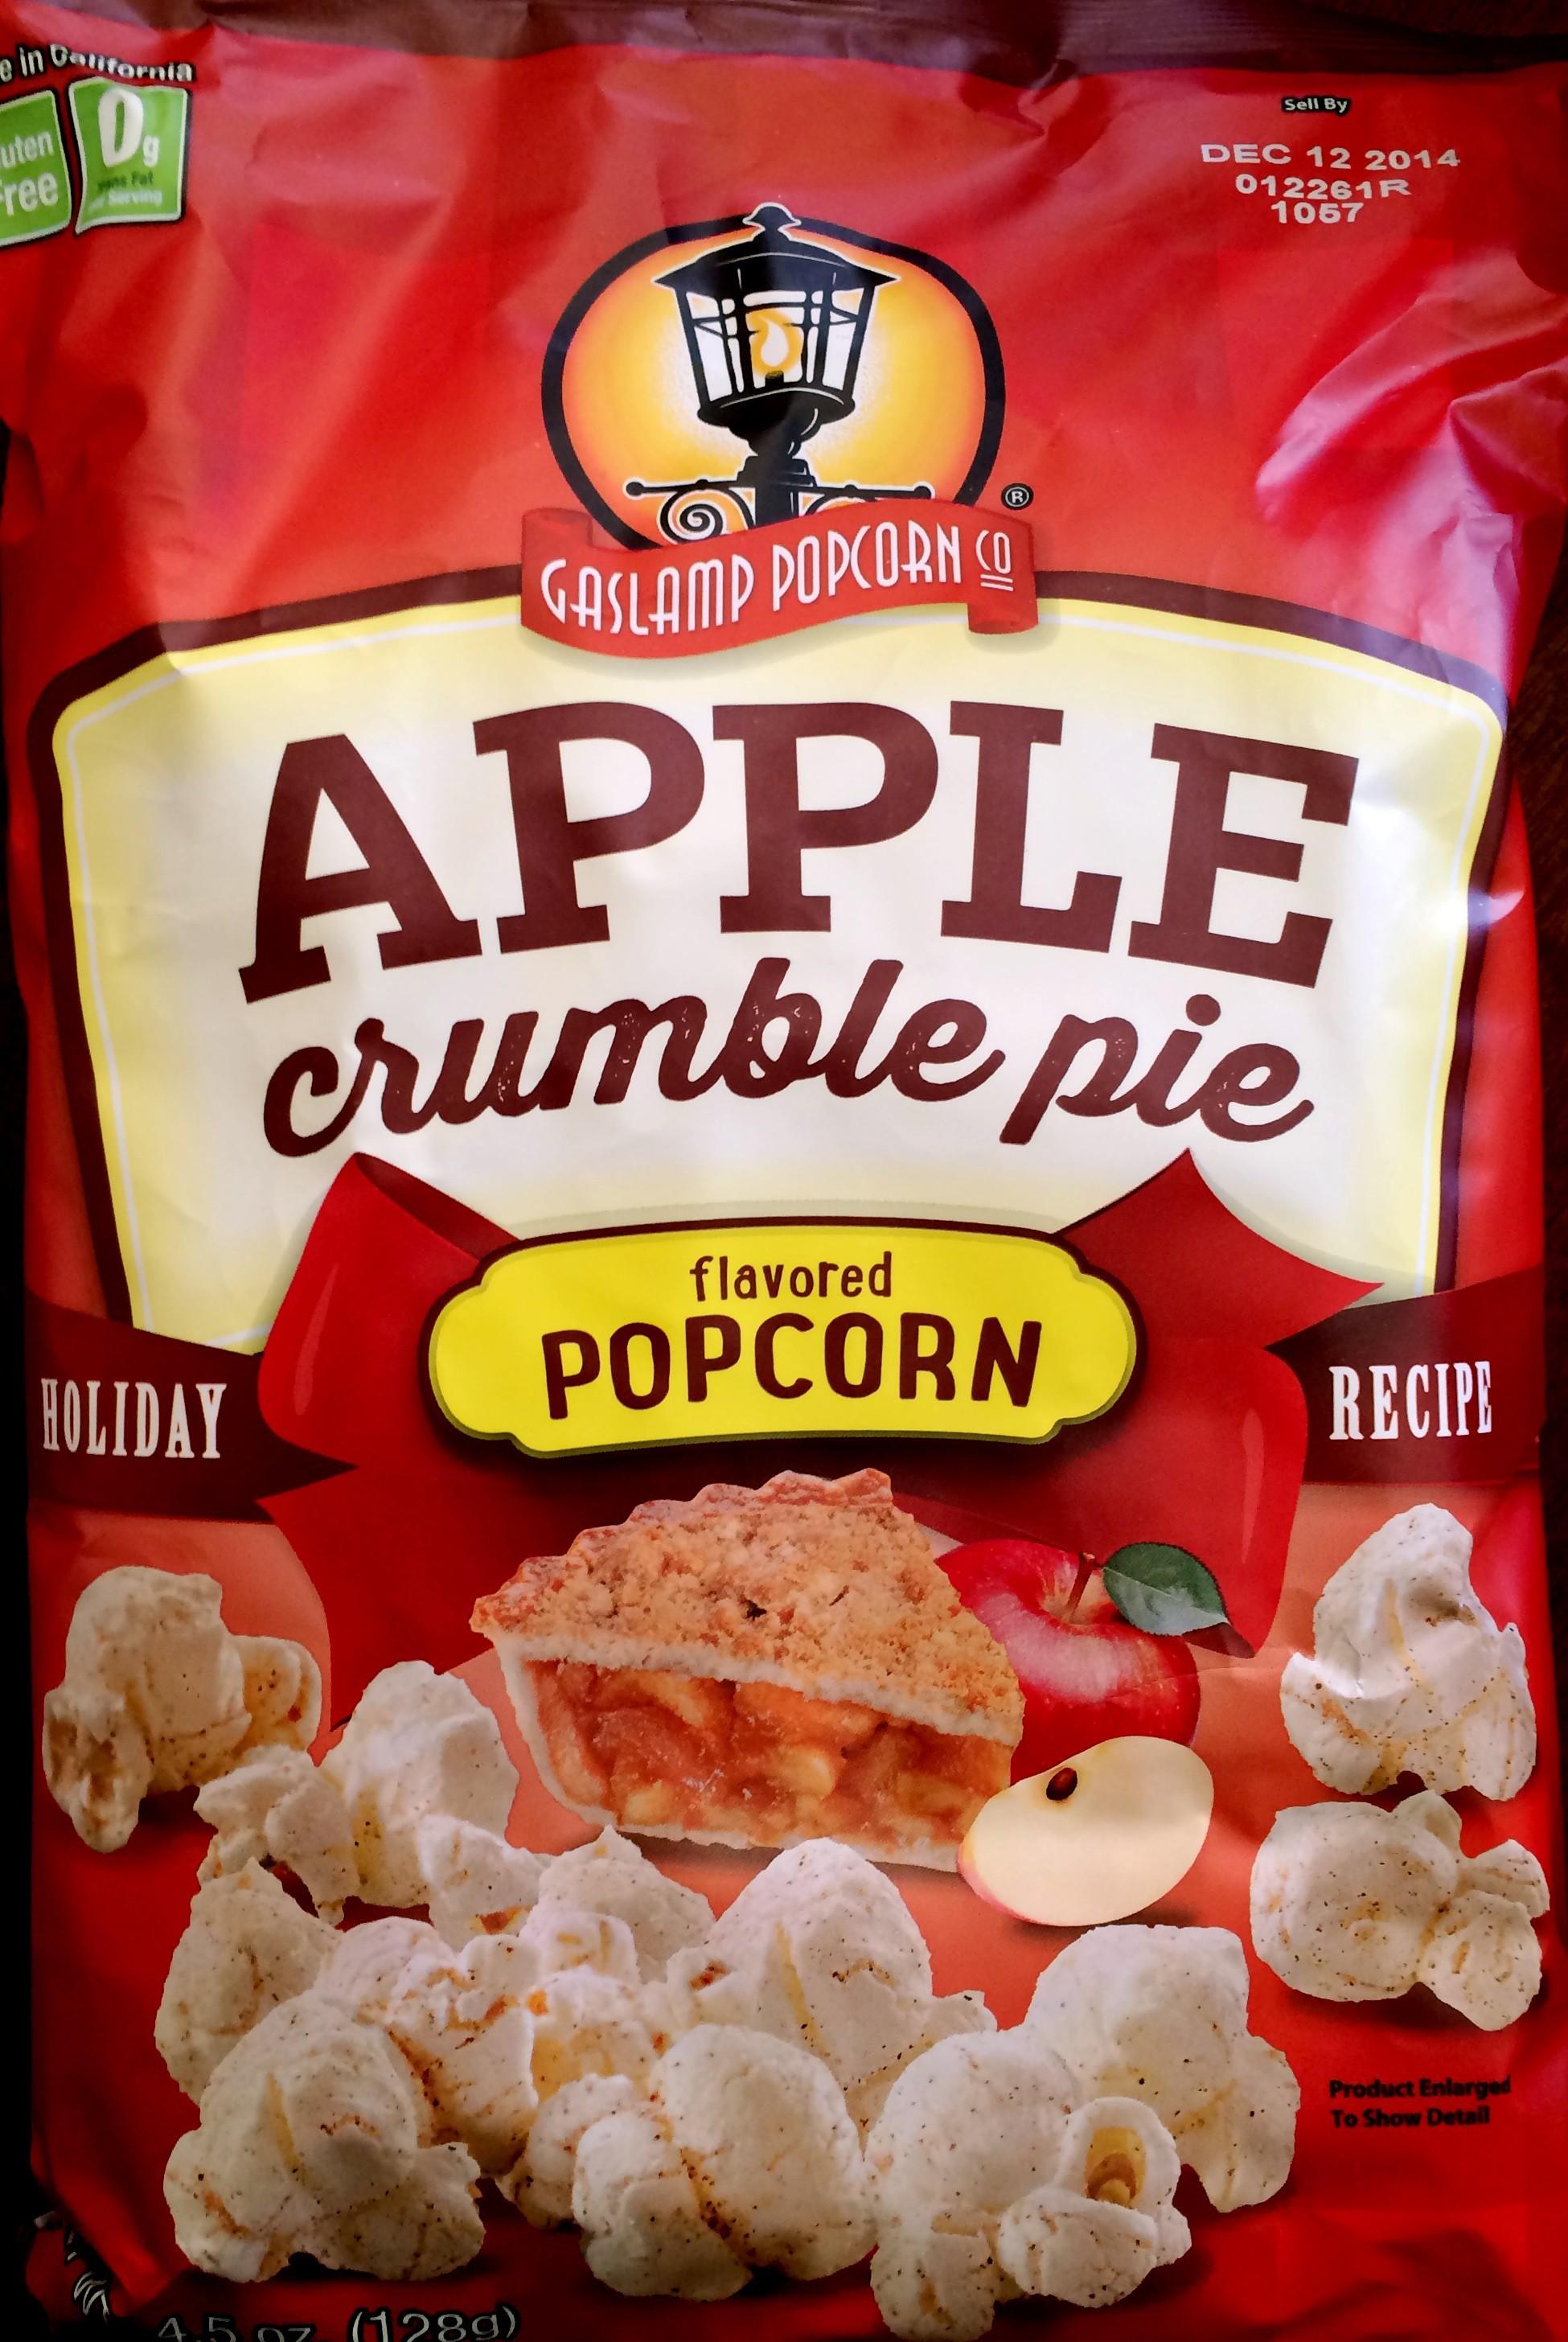 ... : Gaslamp Popcorn Co. – Apple Crumble Pie Popcorn | Chip Review